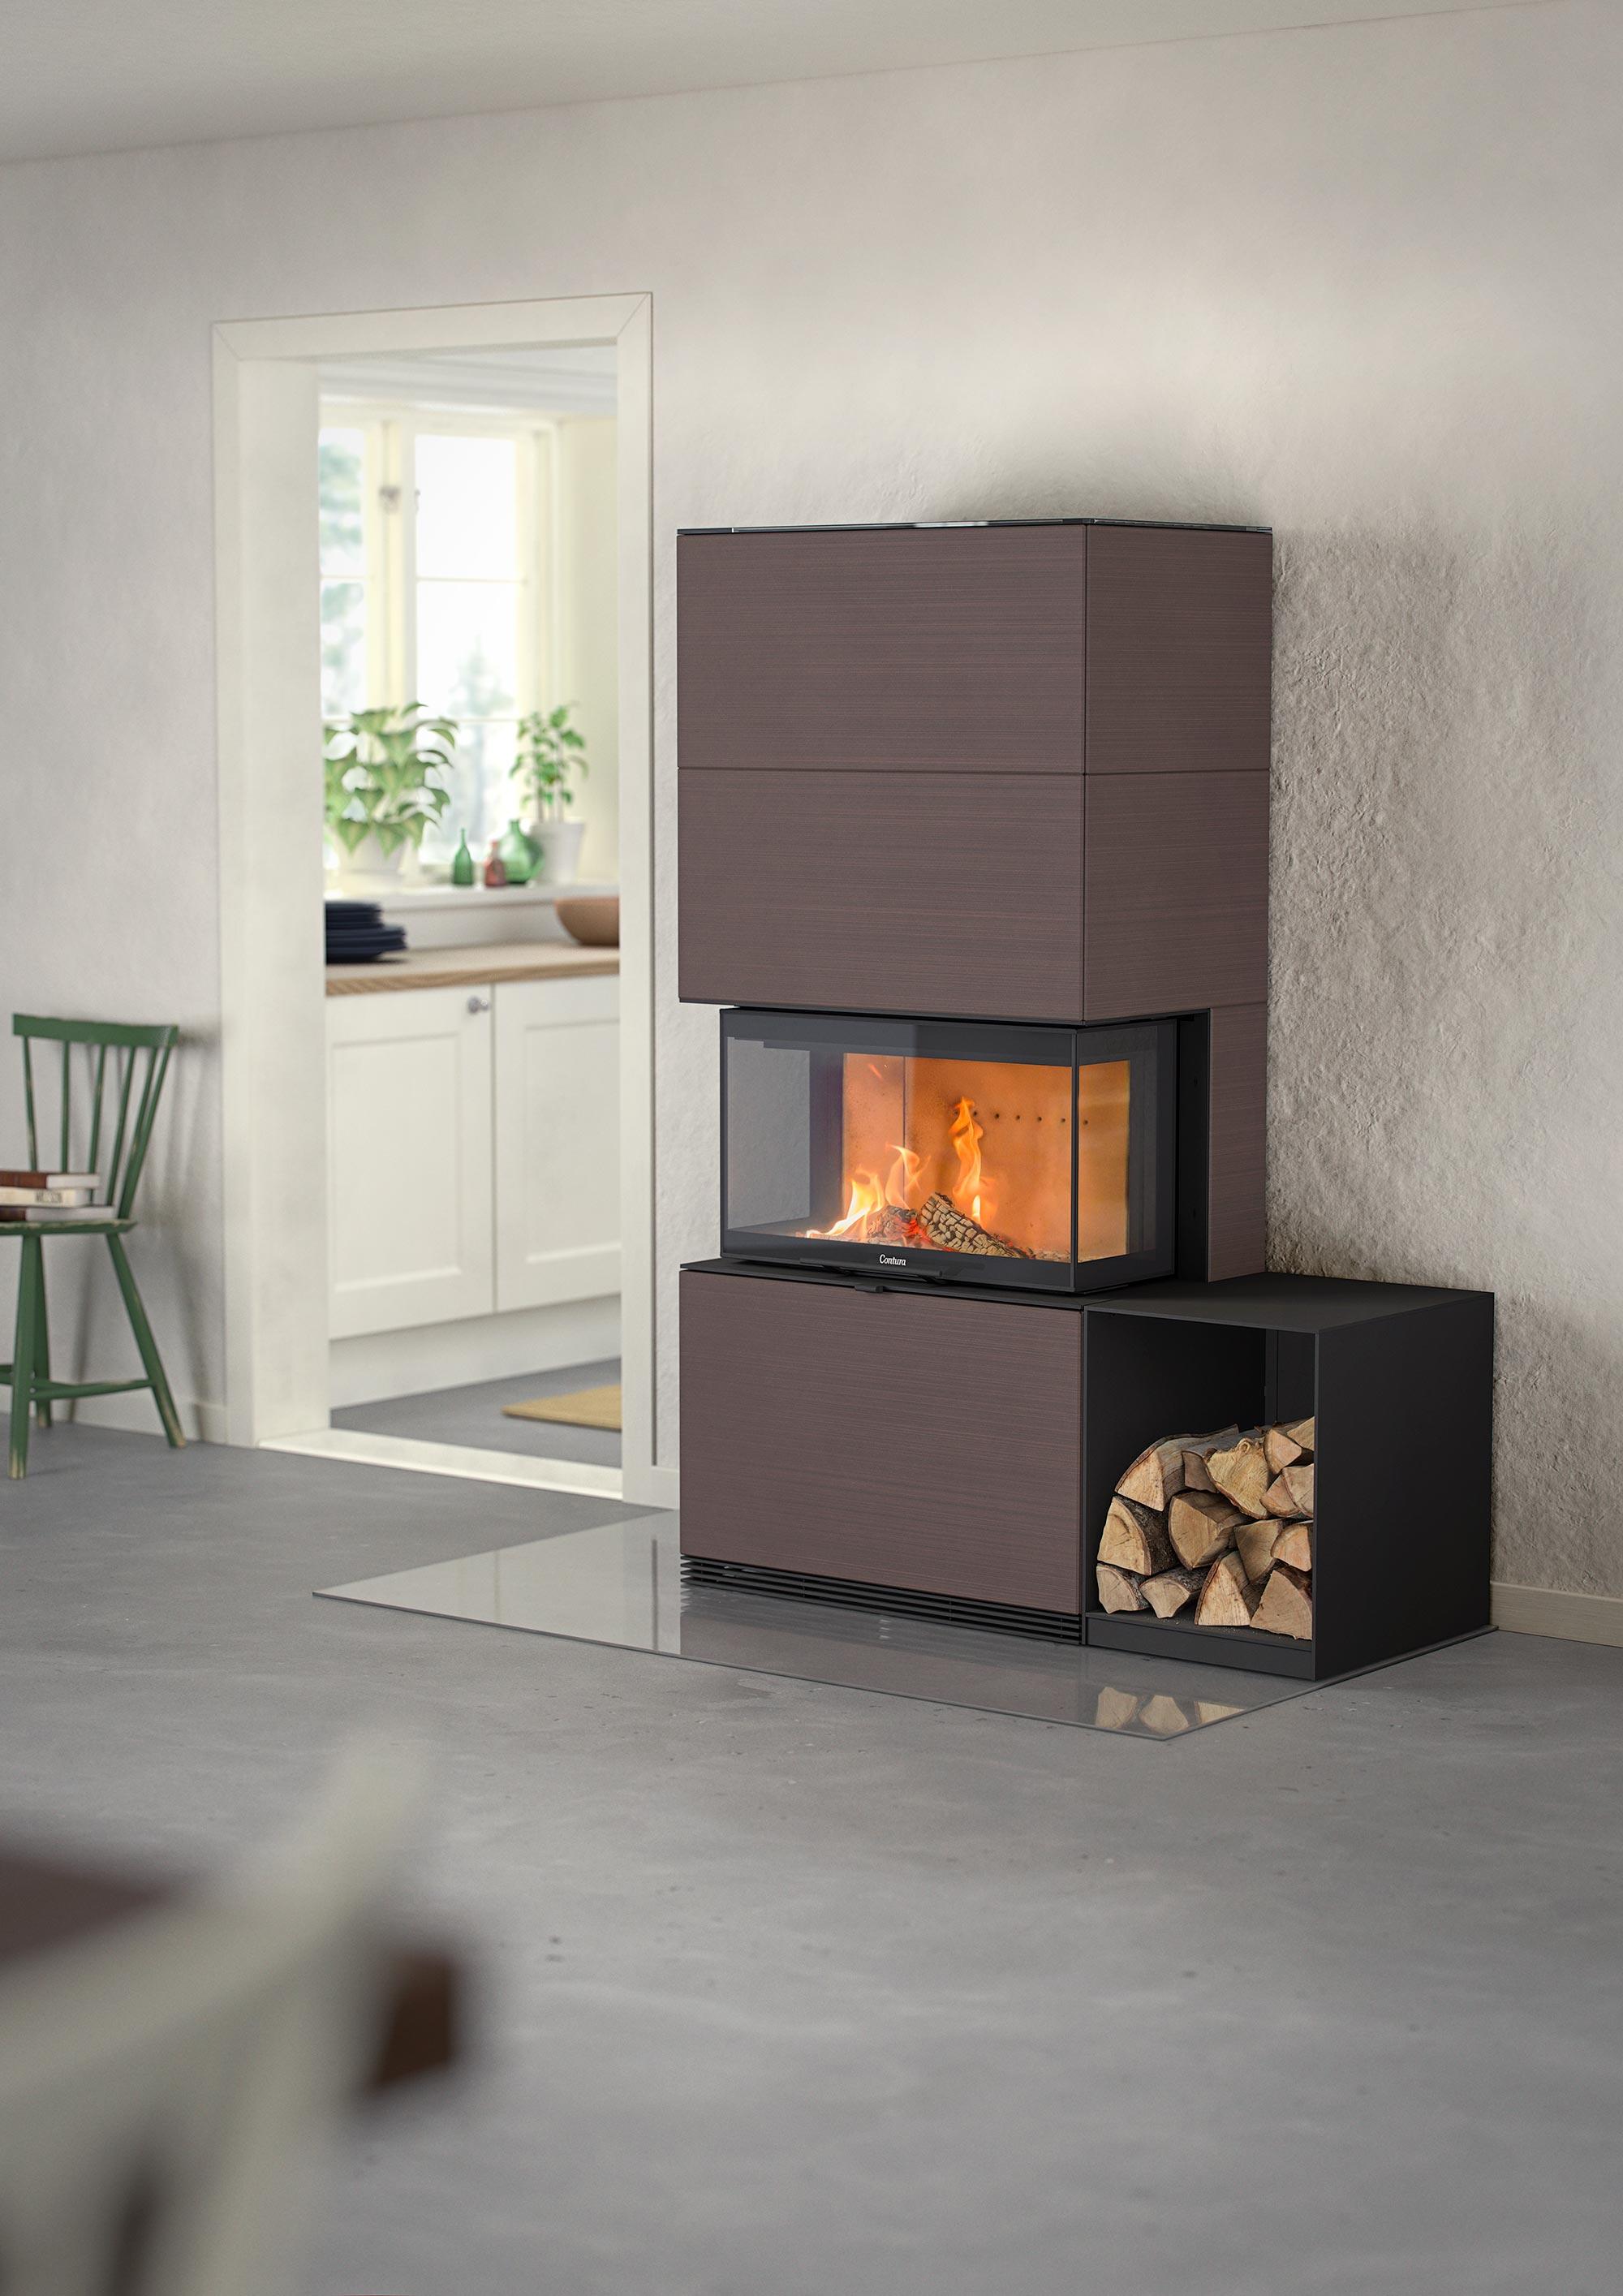 Contura i51 Sandstone Fireplace